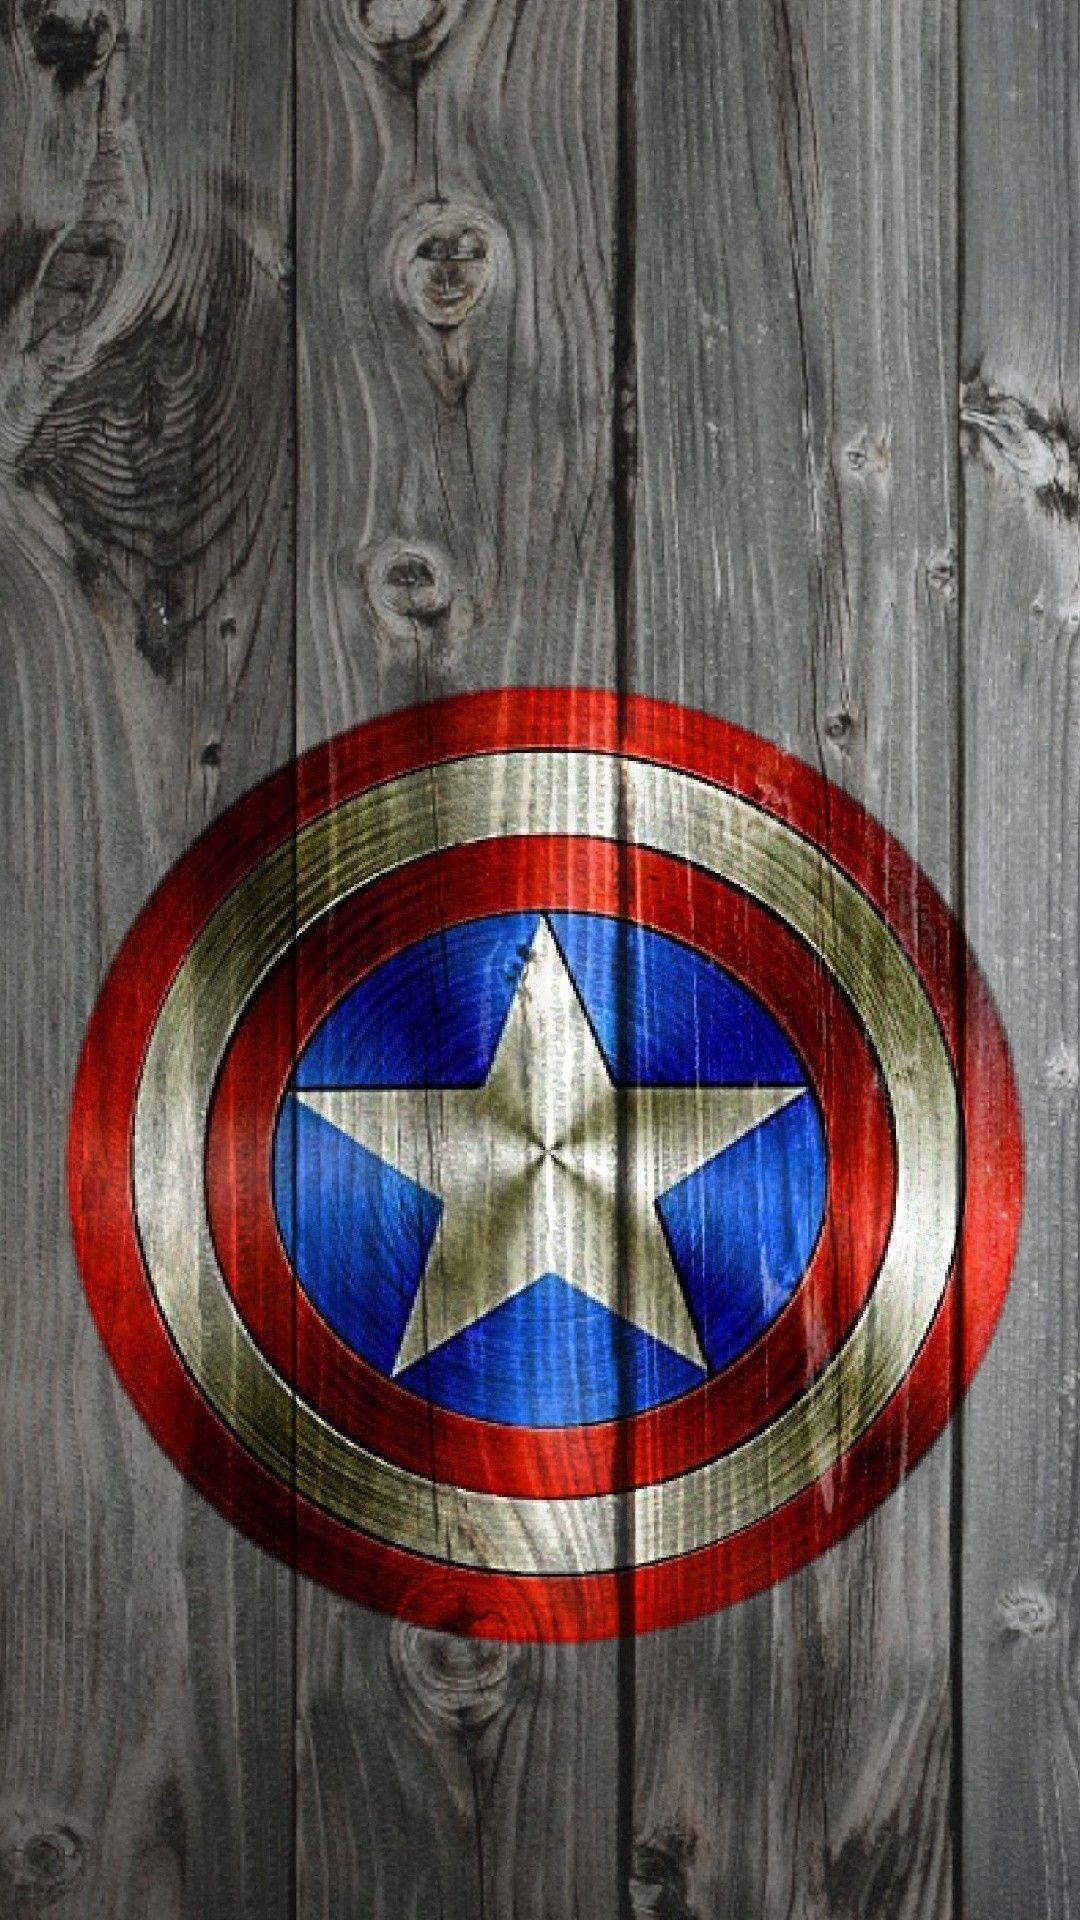 Captain America Wallpaper – [1080×1920] 4K